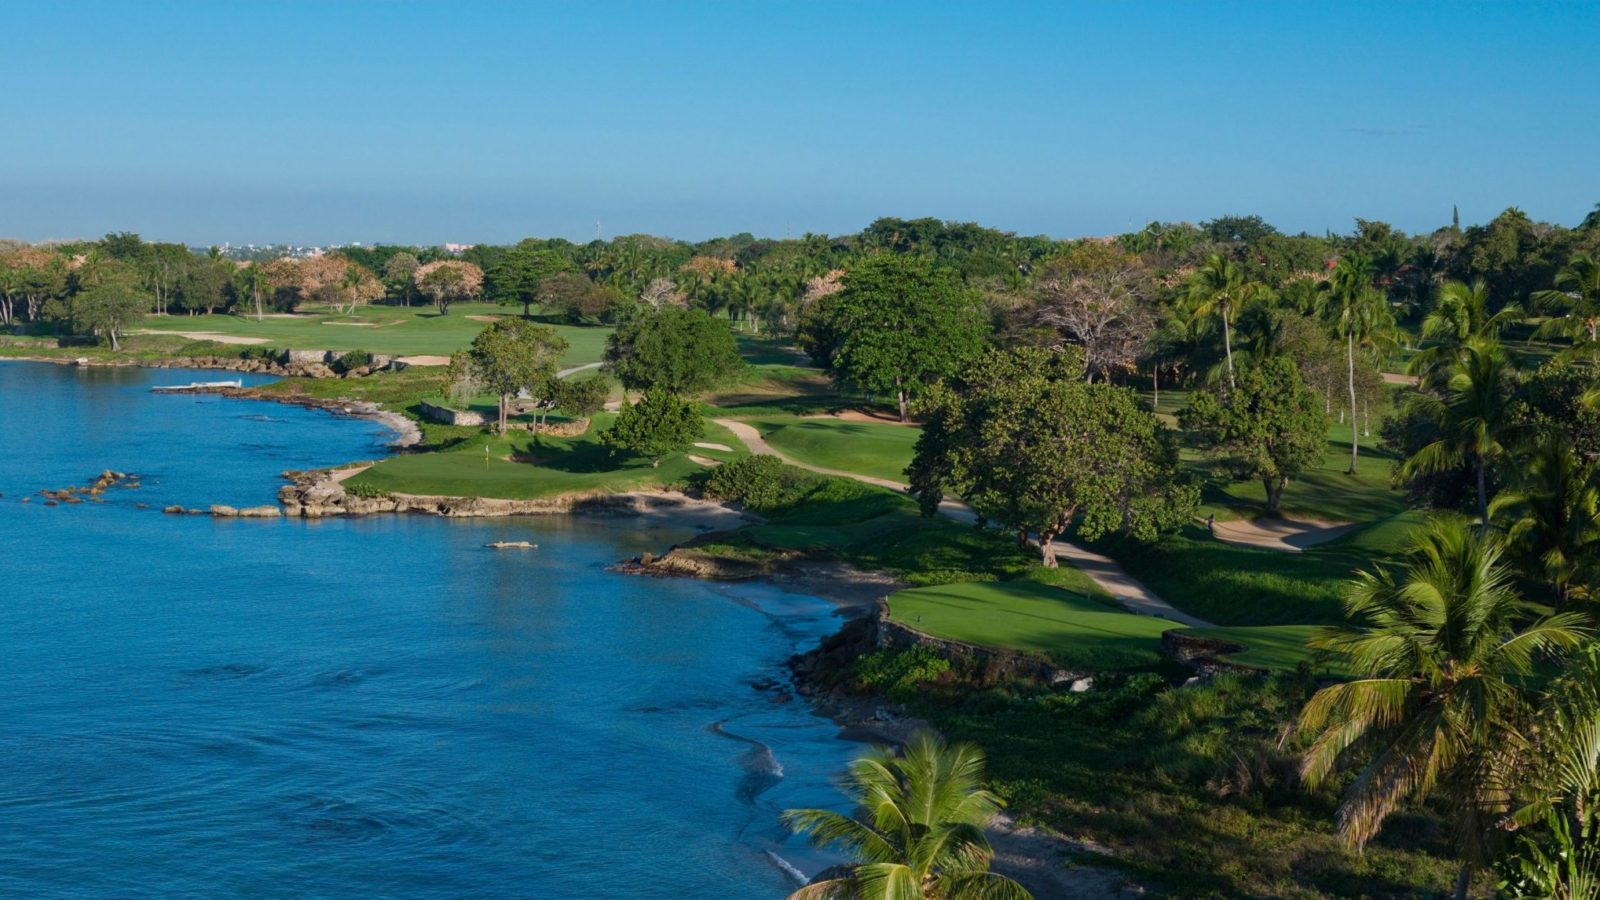 Casa-de-Campo-golf